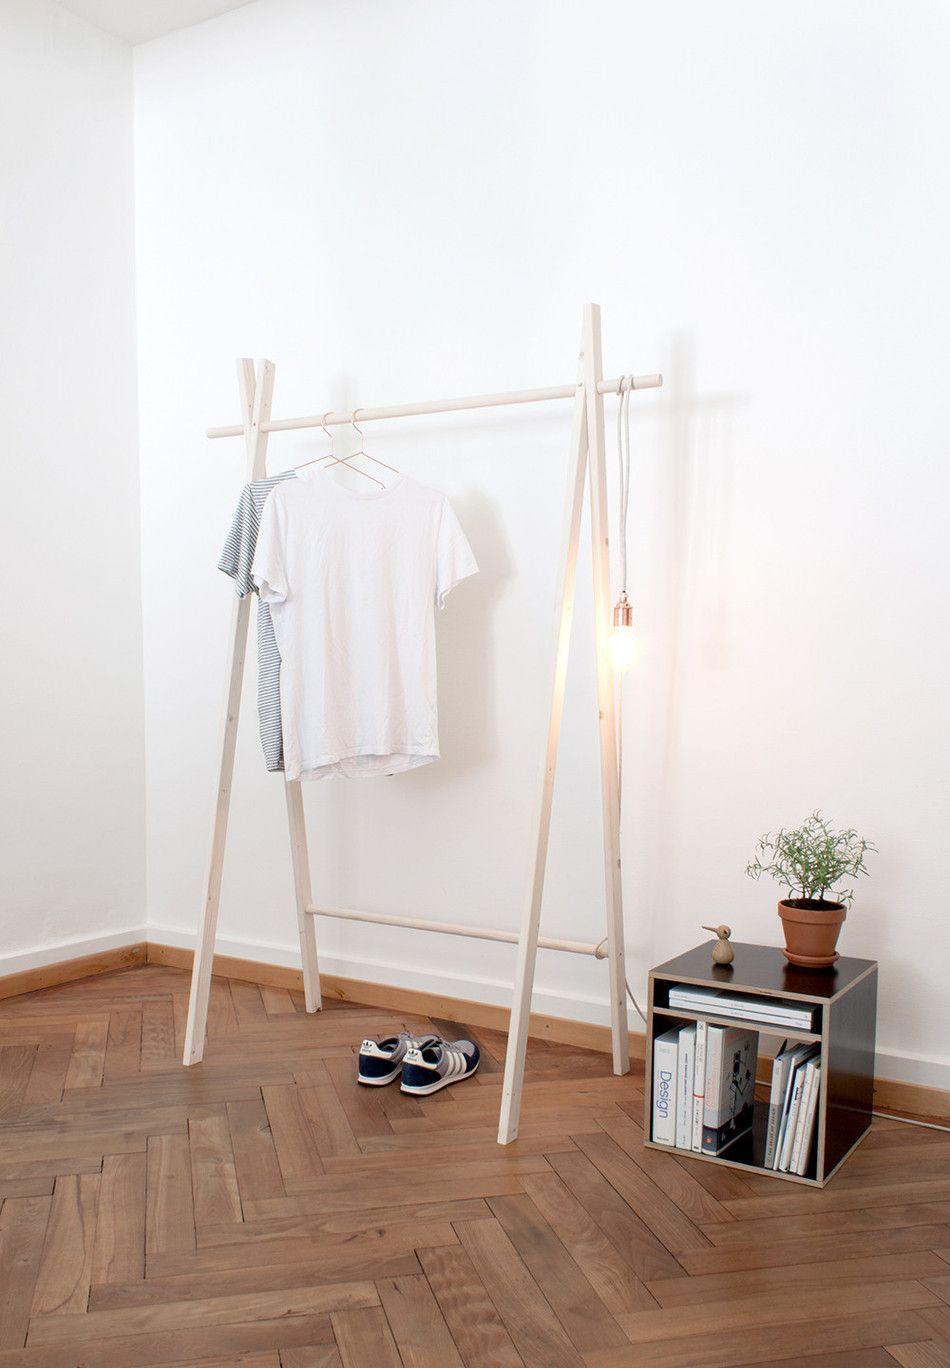 pin van laura op diy pinterest kledingrekken interieur en accessoires. Black Bedroom Furniture Sets. Home Design Ideas